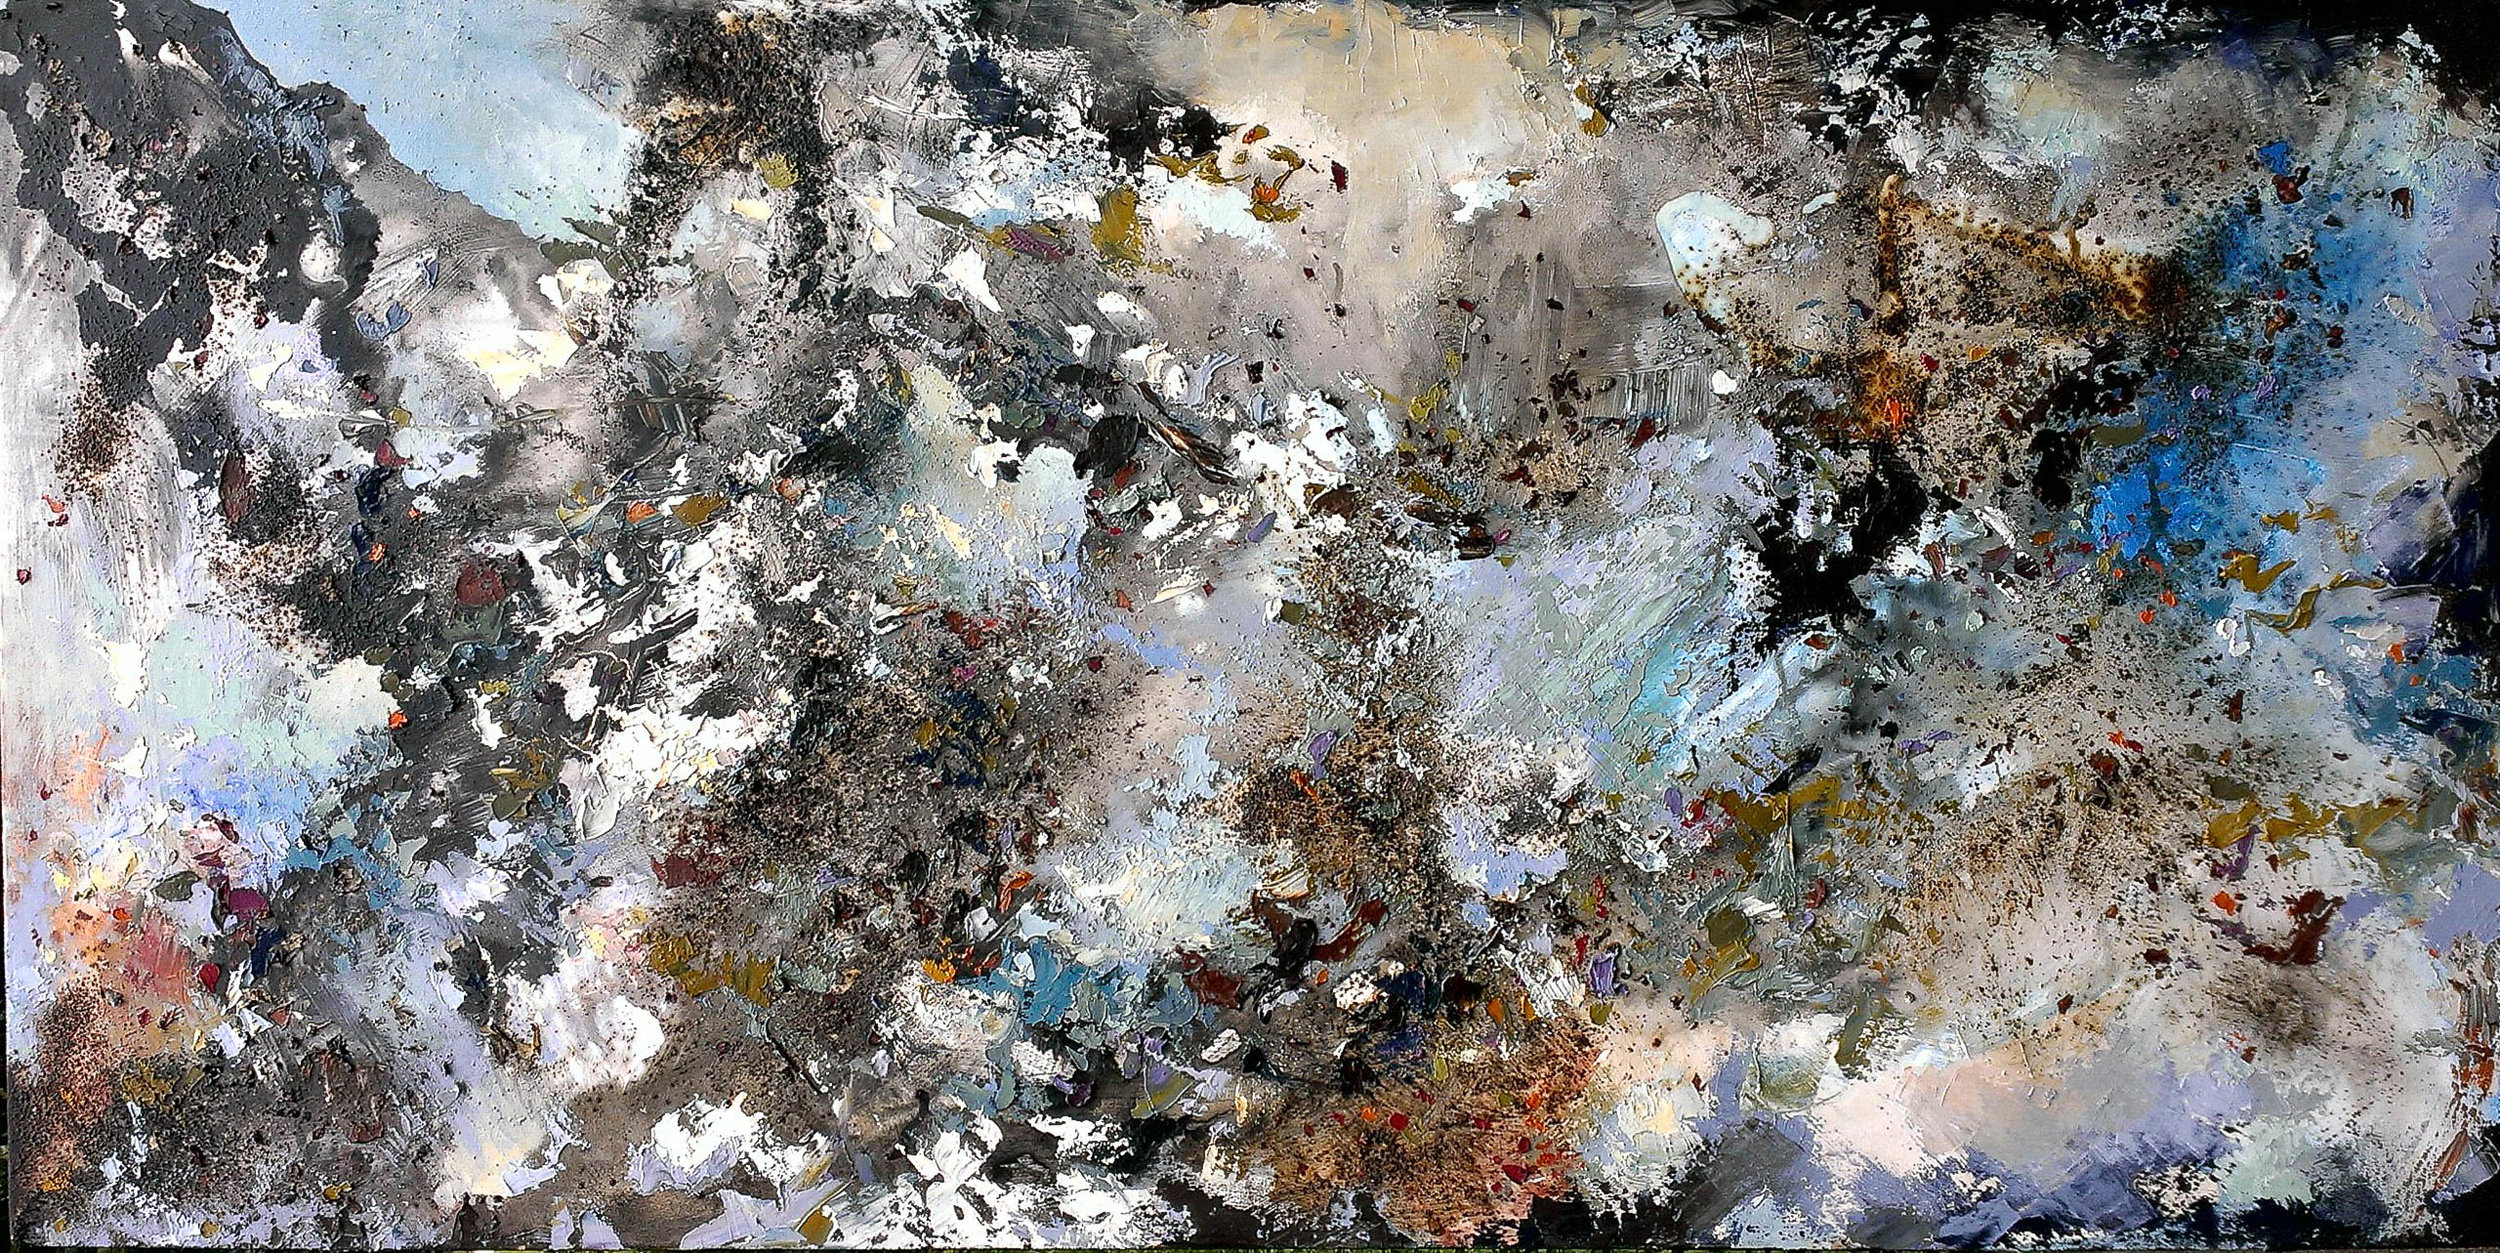 Abstract-4-2.jpg